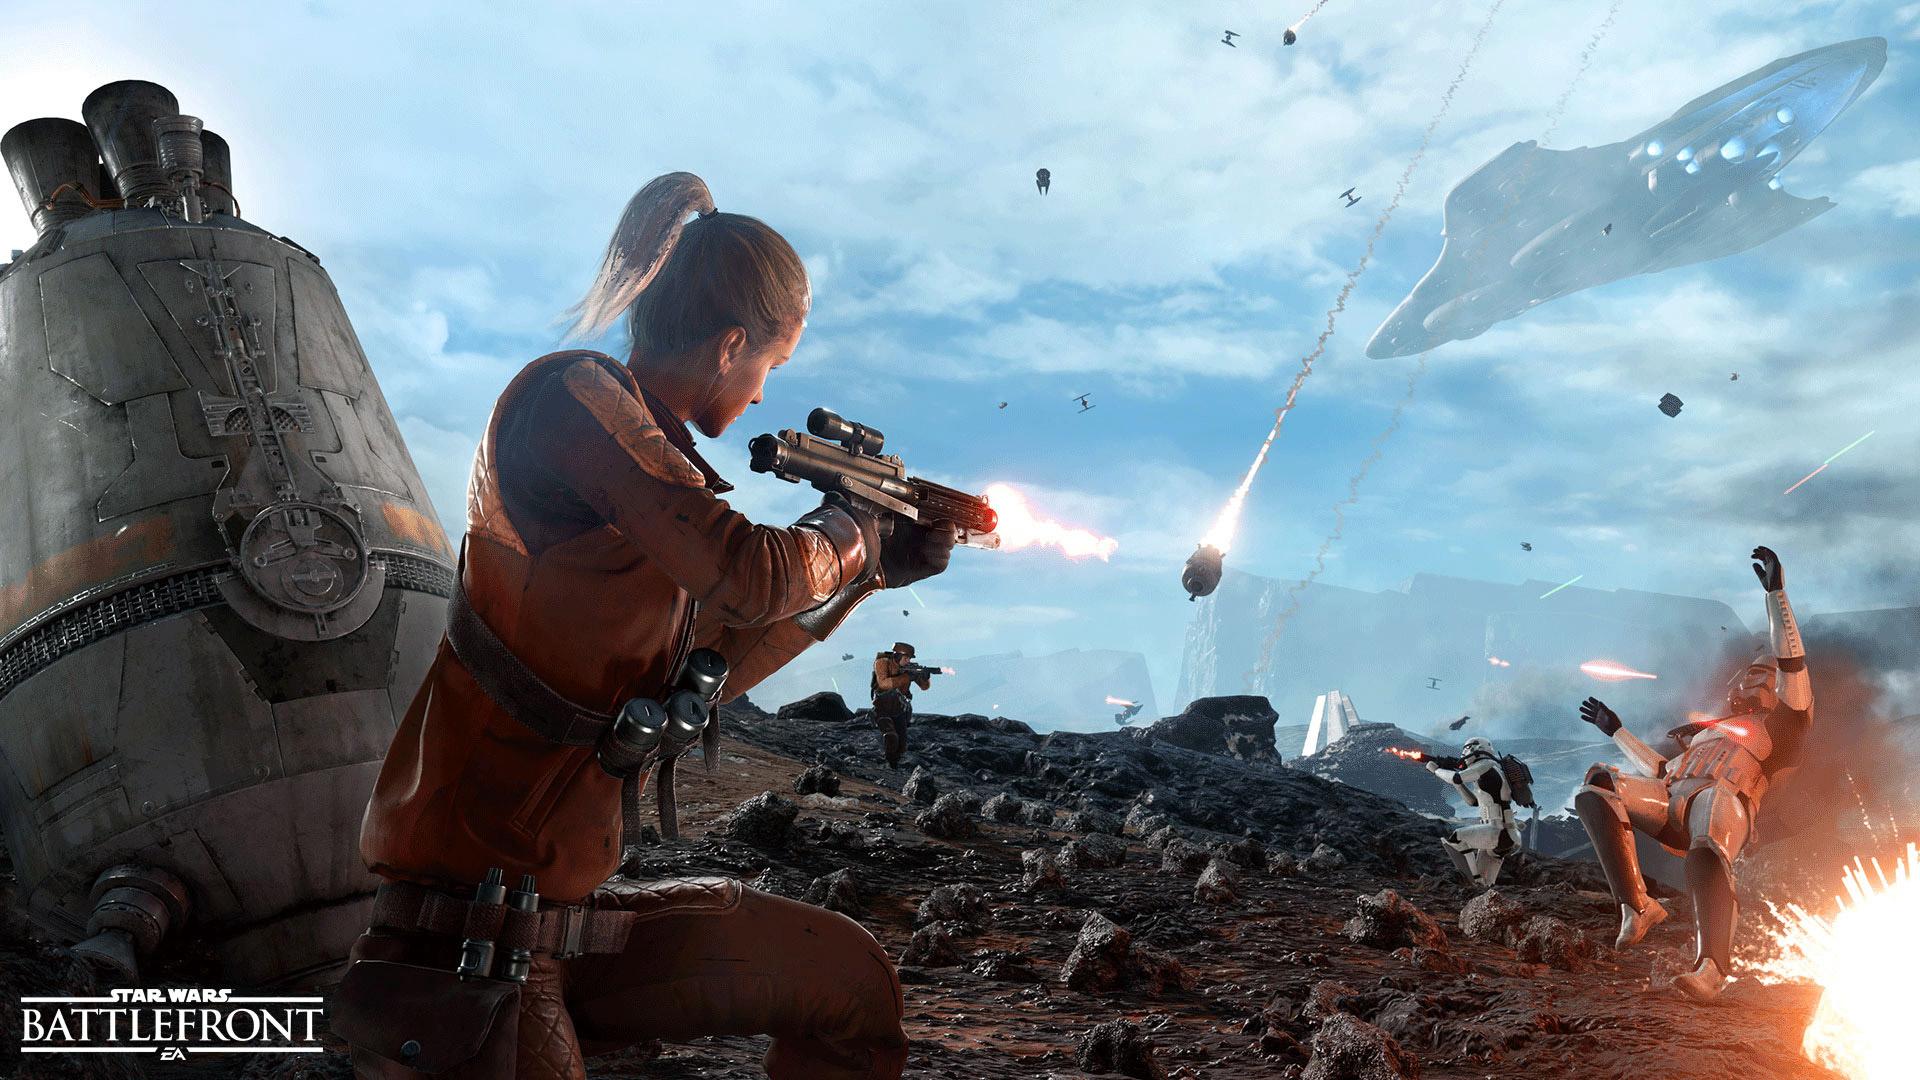 Star Wars Battlefront wallpaper 18